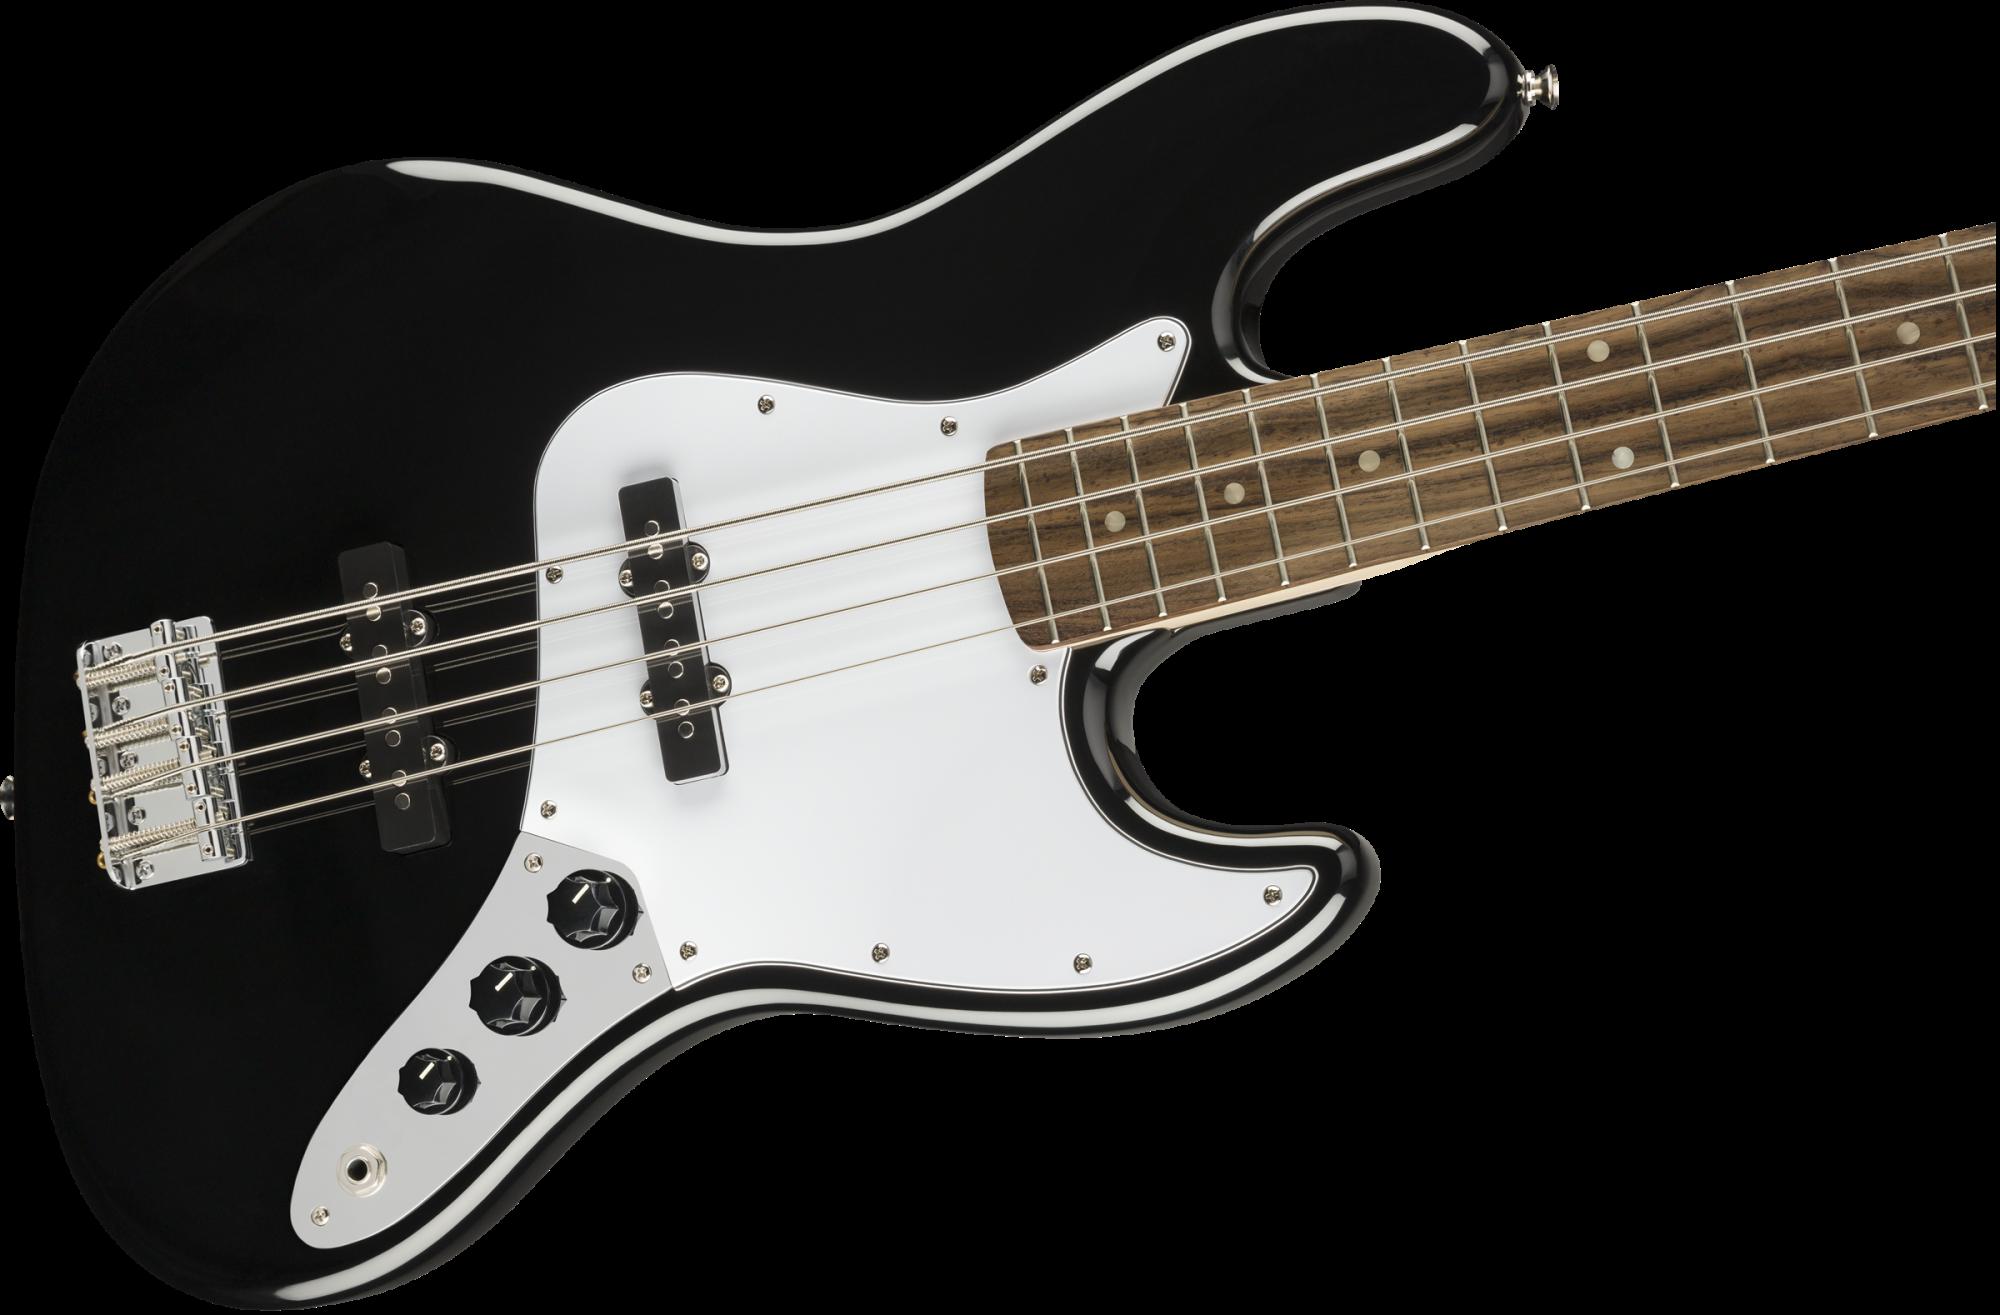 Squier Affinity Series Jazz Bass, Laurel Fingerboard, Black